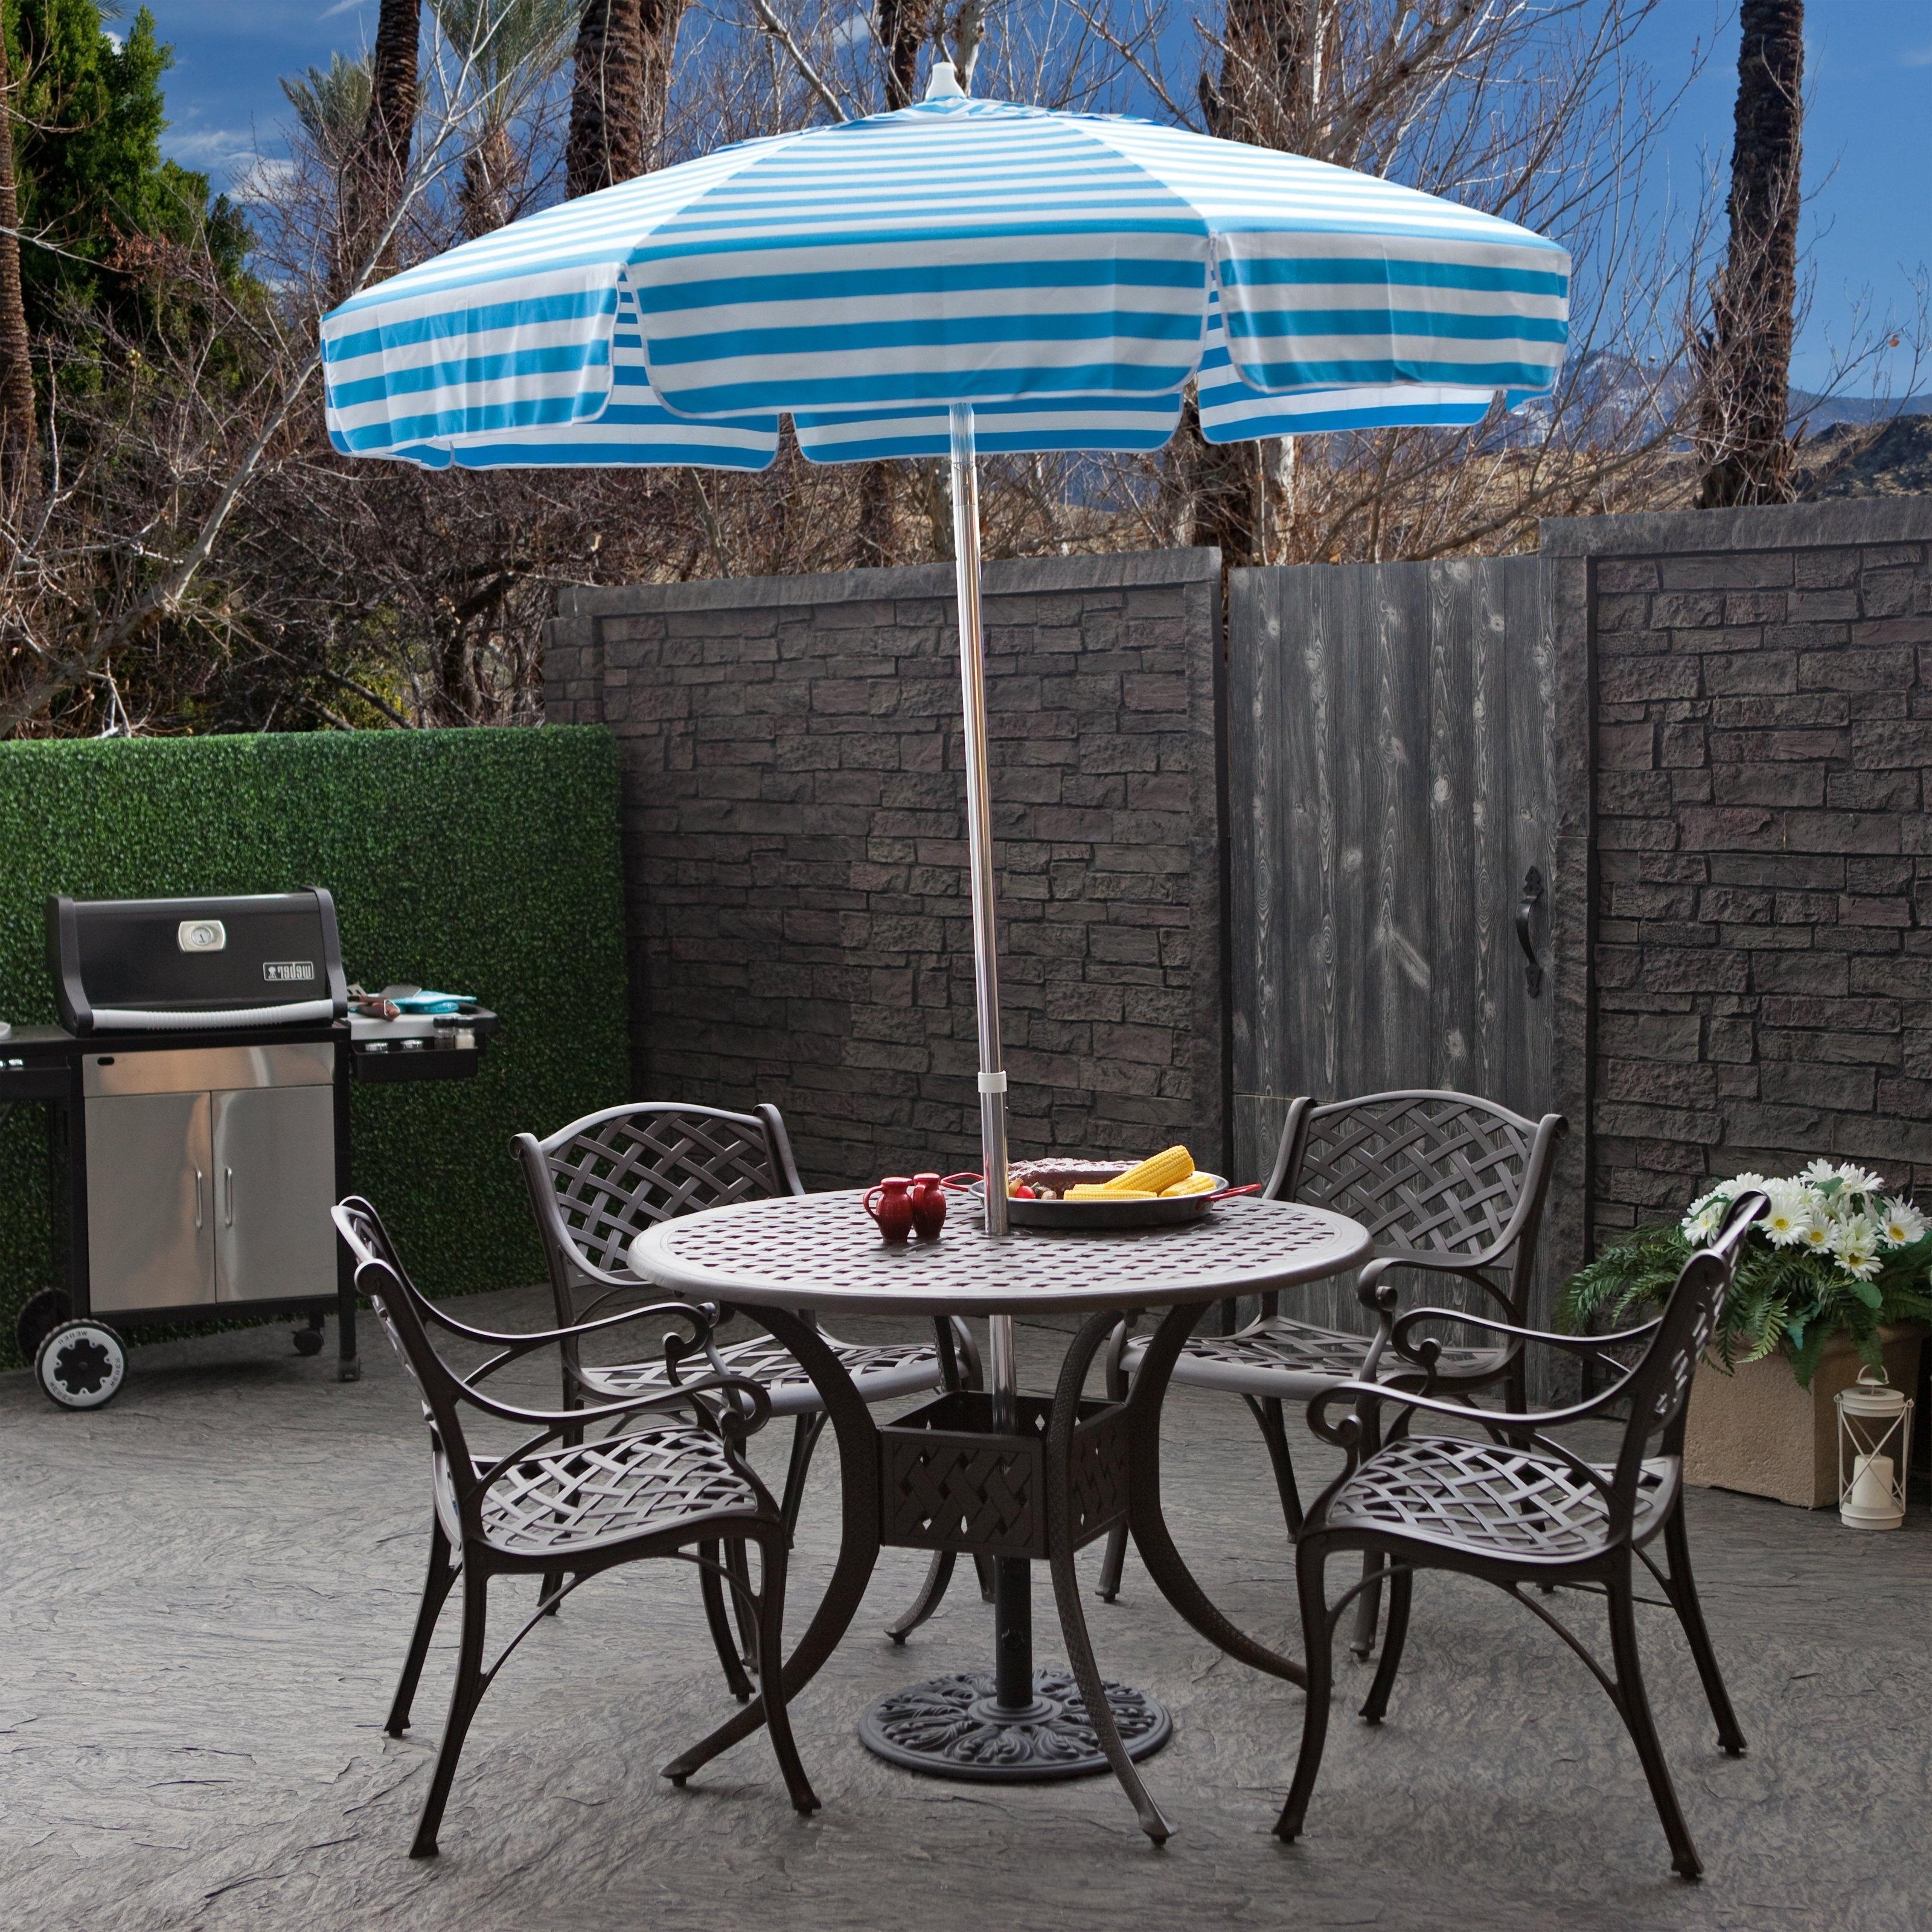 Incredible Patio Table Umbrellas Destinationgear 6 Ft Aluminum With 2019 6 Ft Patio Umbrellas (View 12 of 20)